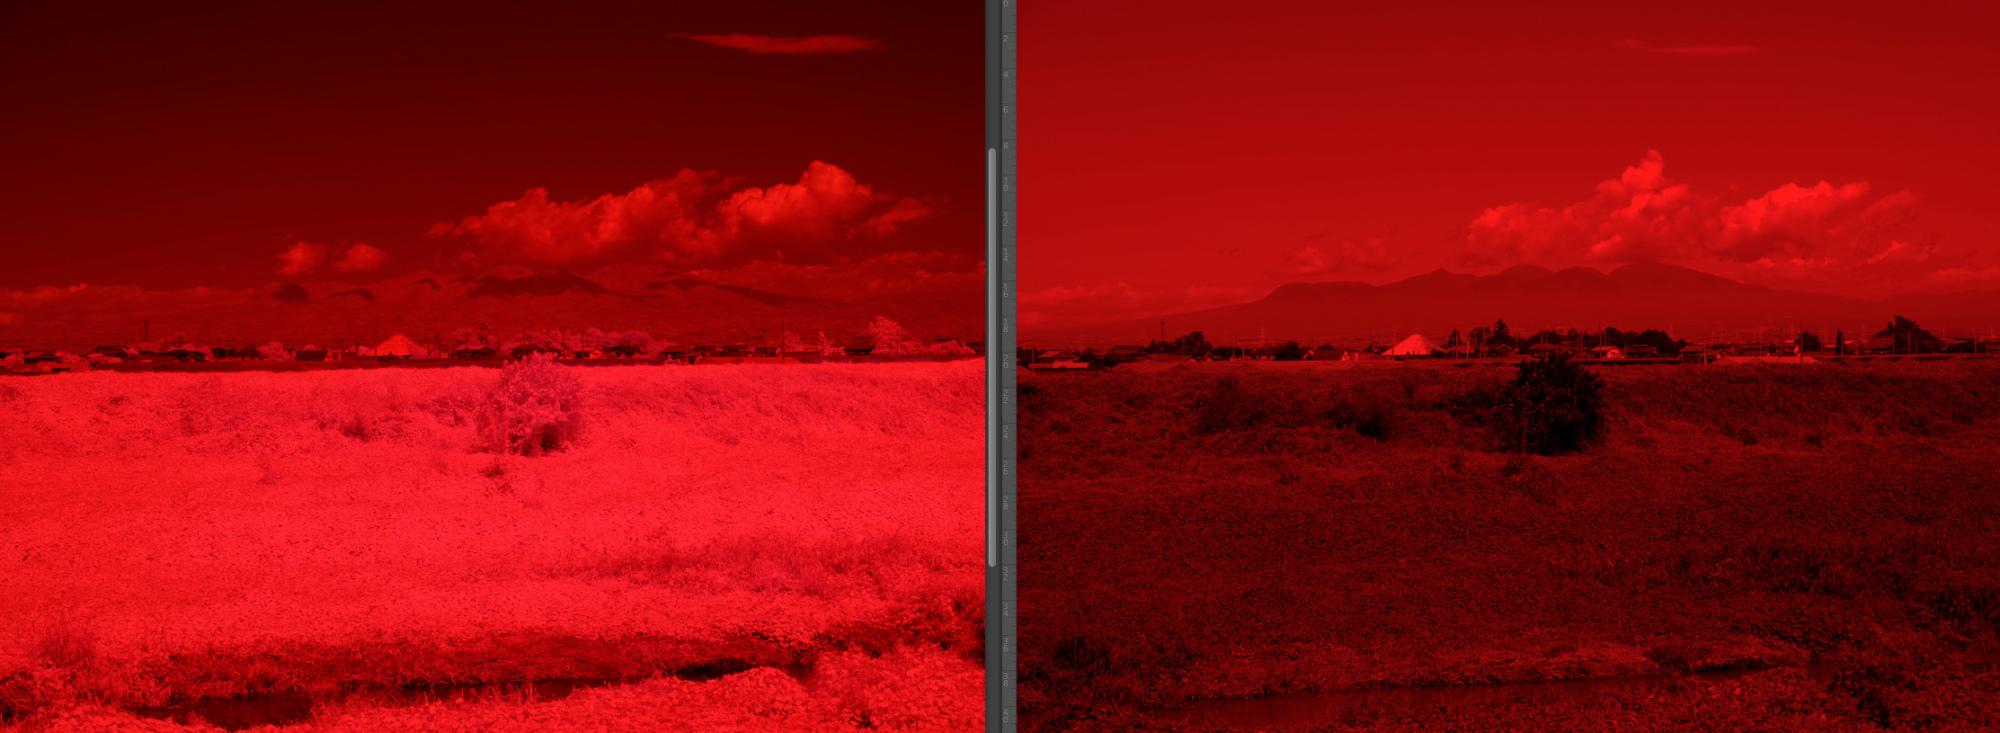 Red_IR.thumb.jpg.a835729195a1433029538feeb74ec956.jpg